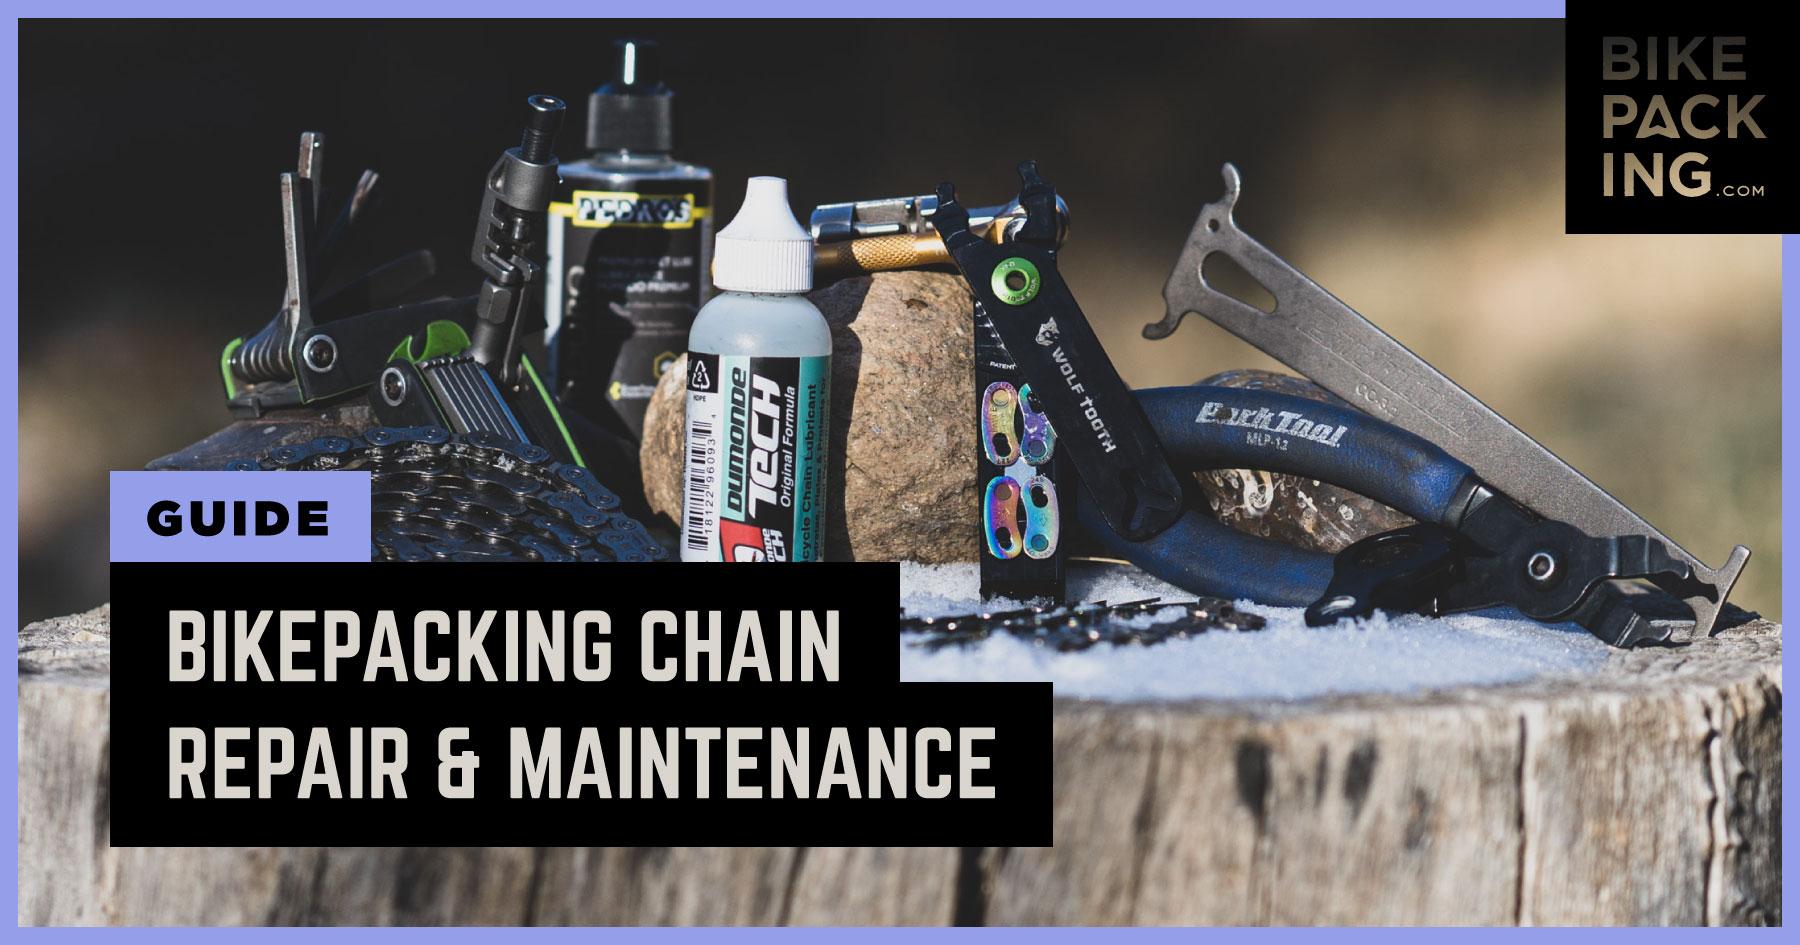 Guide to Bike Chain Repair and Maintenance